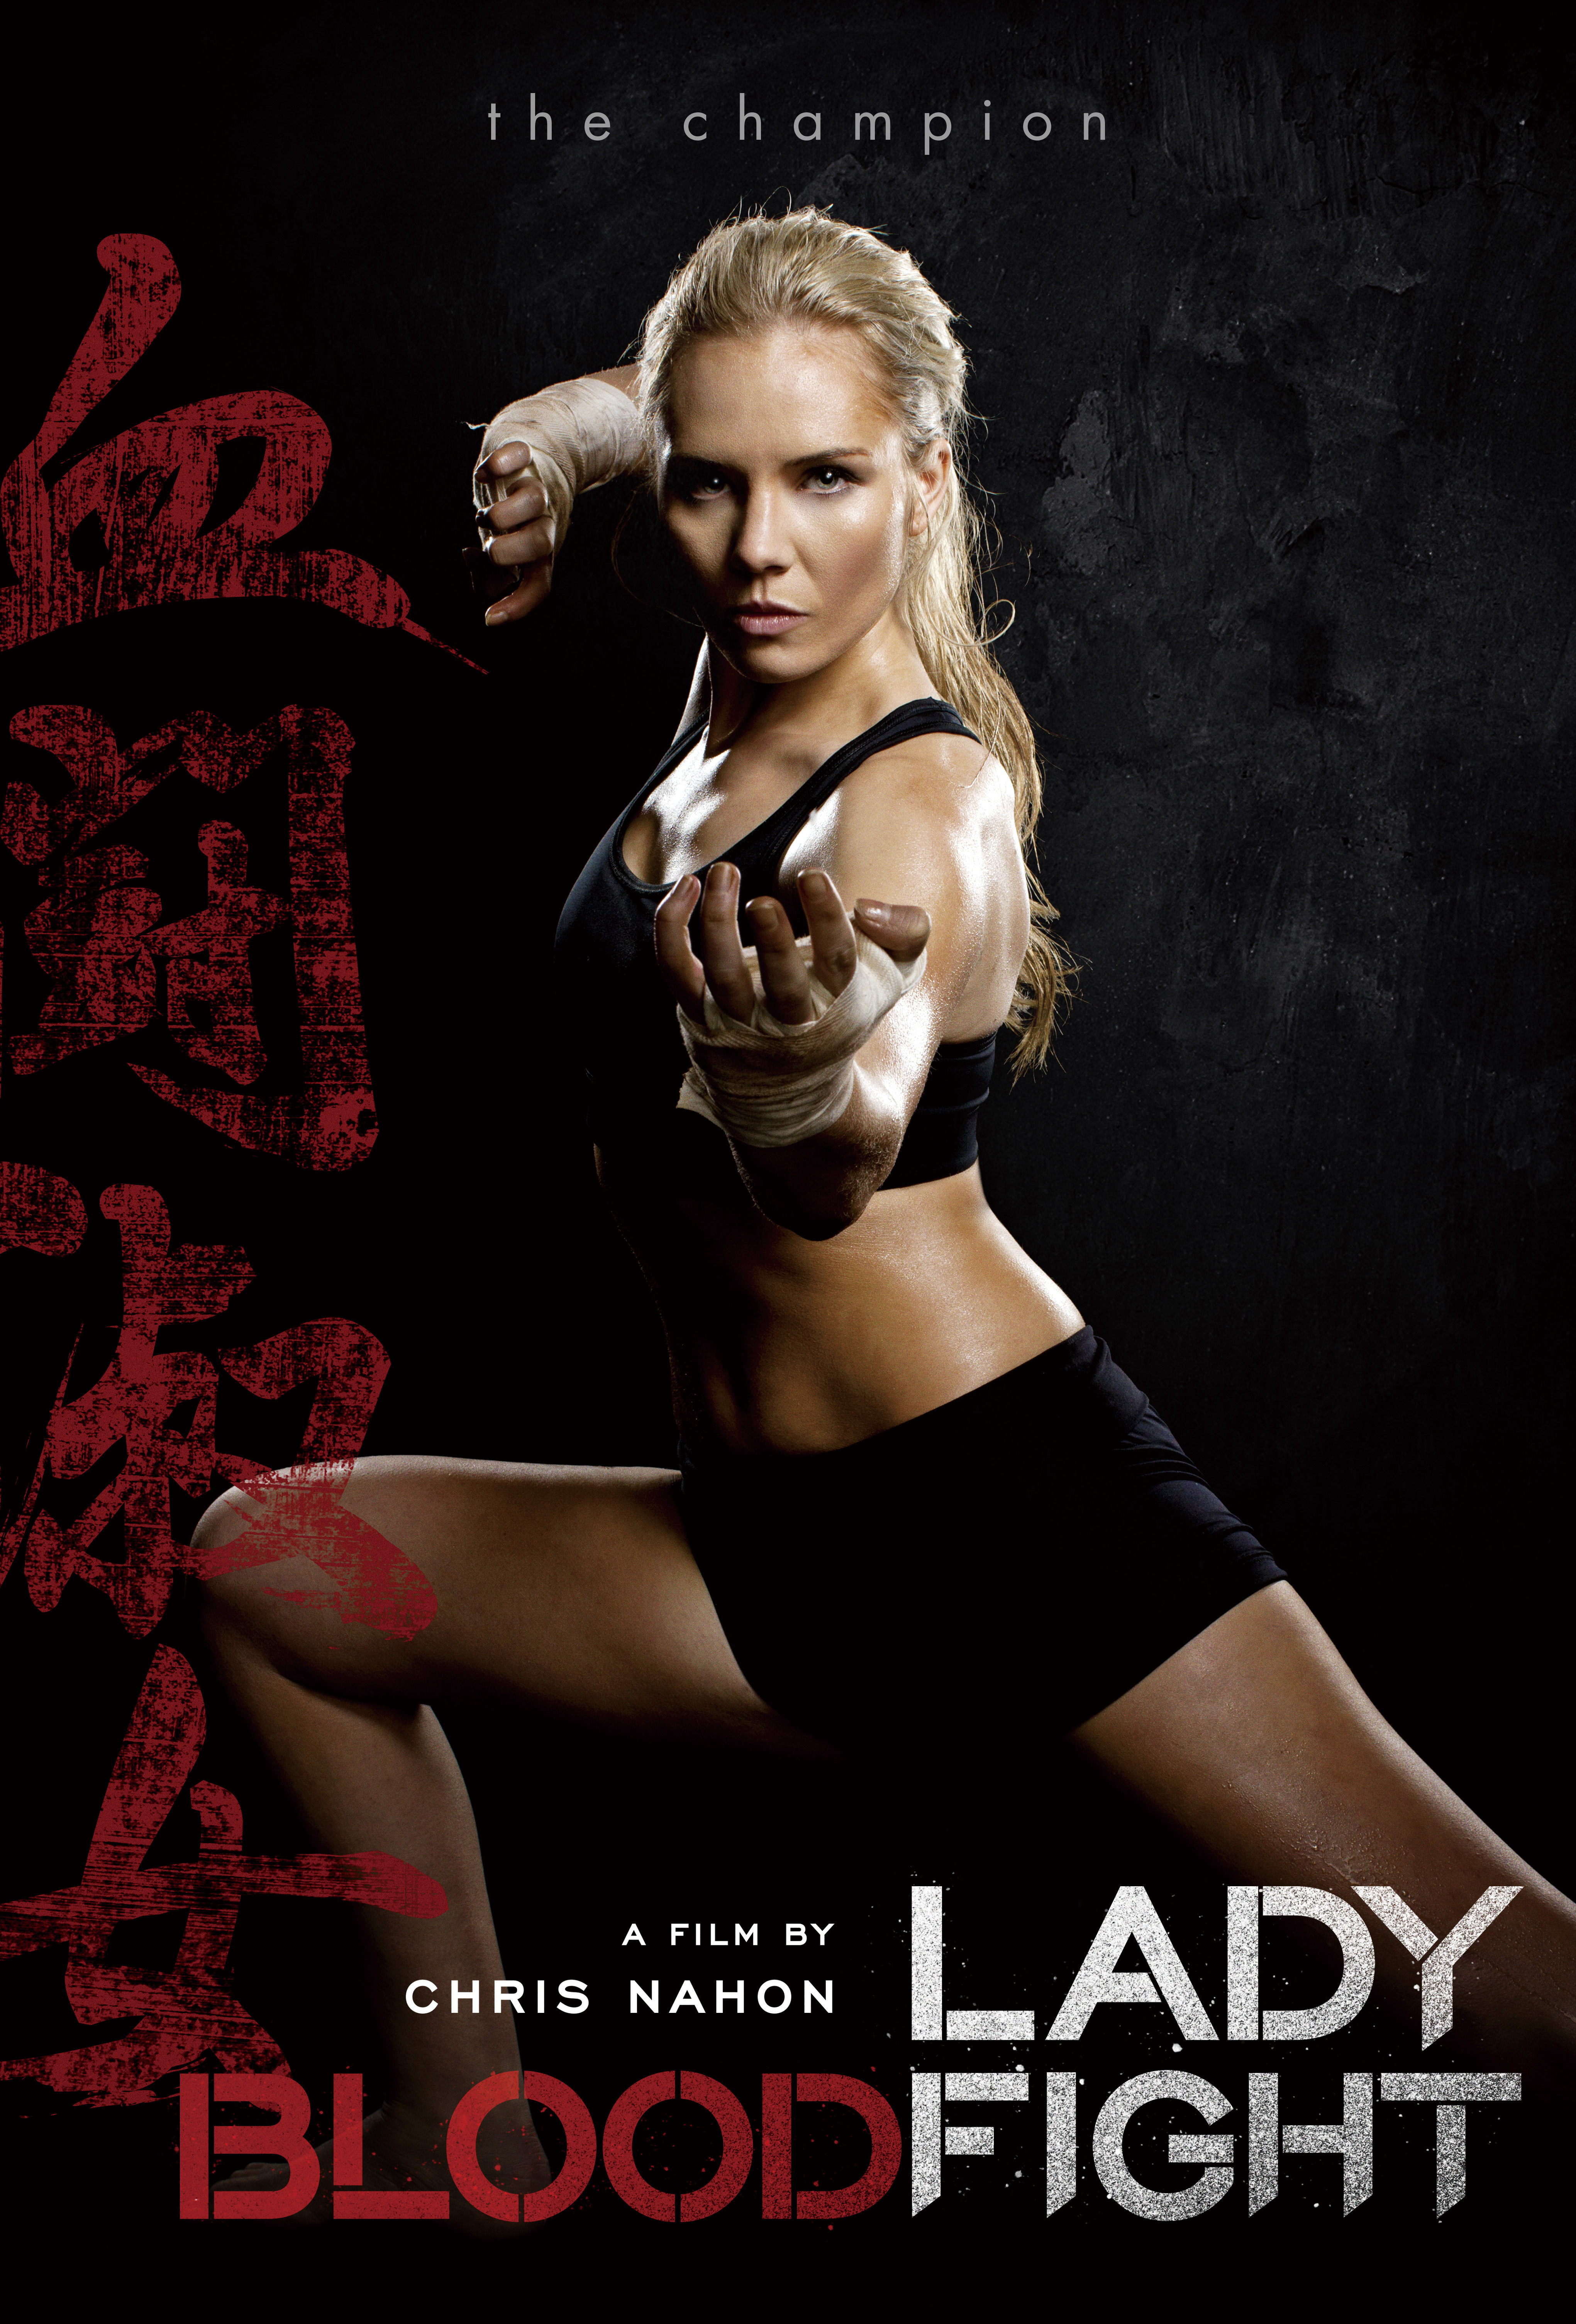 ladyblood_champ_fix_{1c24d77c-c898-e311-b062-d4ae527c3b65}.jpg